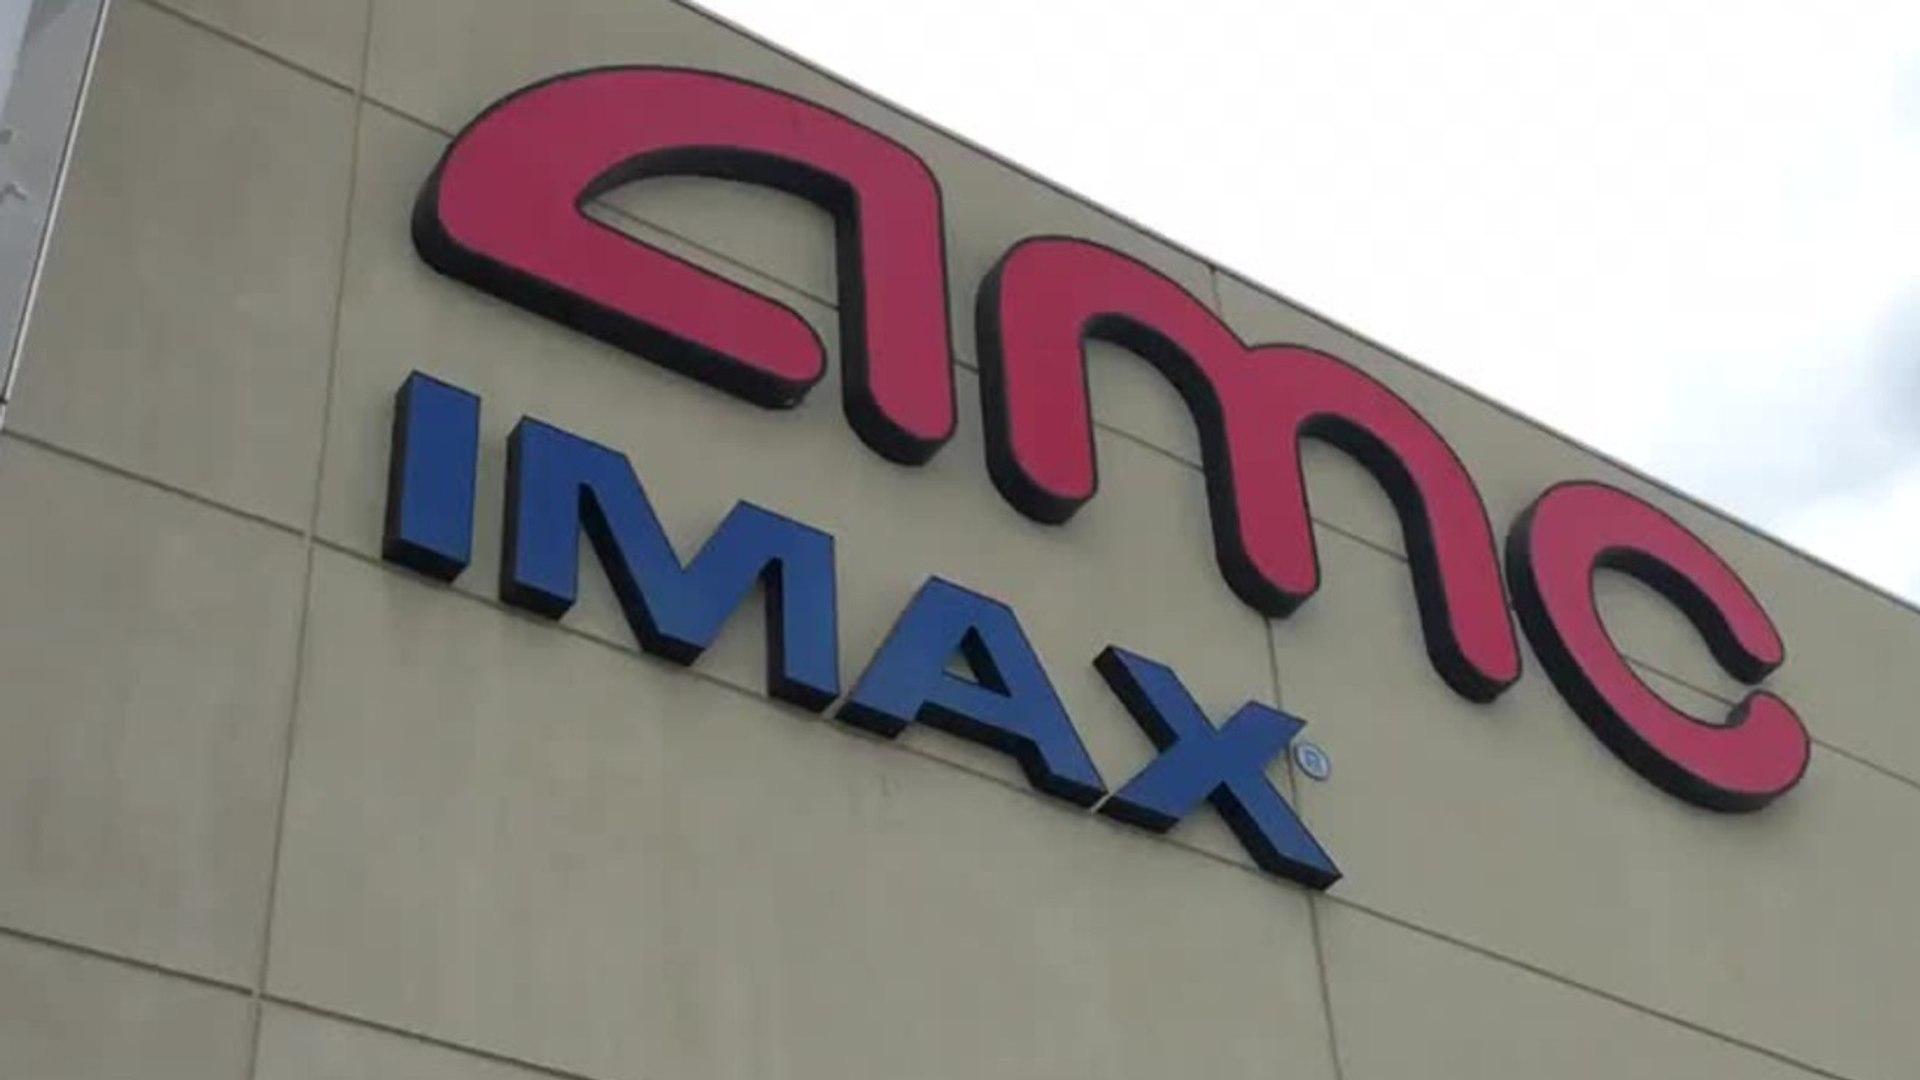 AMC Adding 2AM Screenings For Star Wars: The Last Jedi